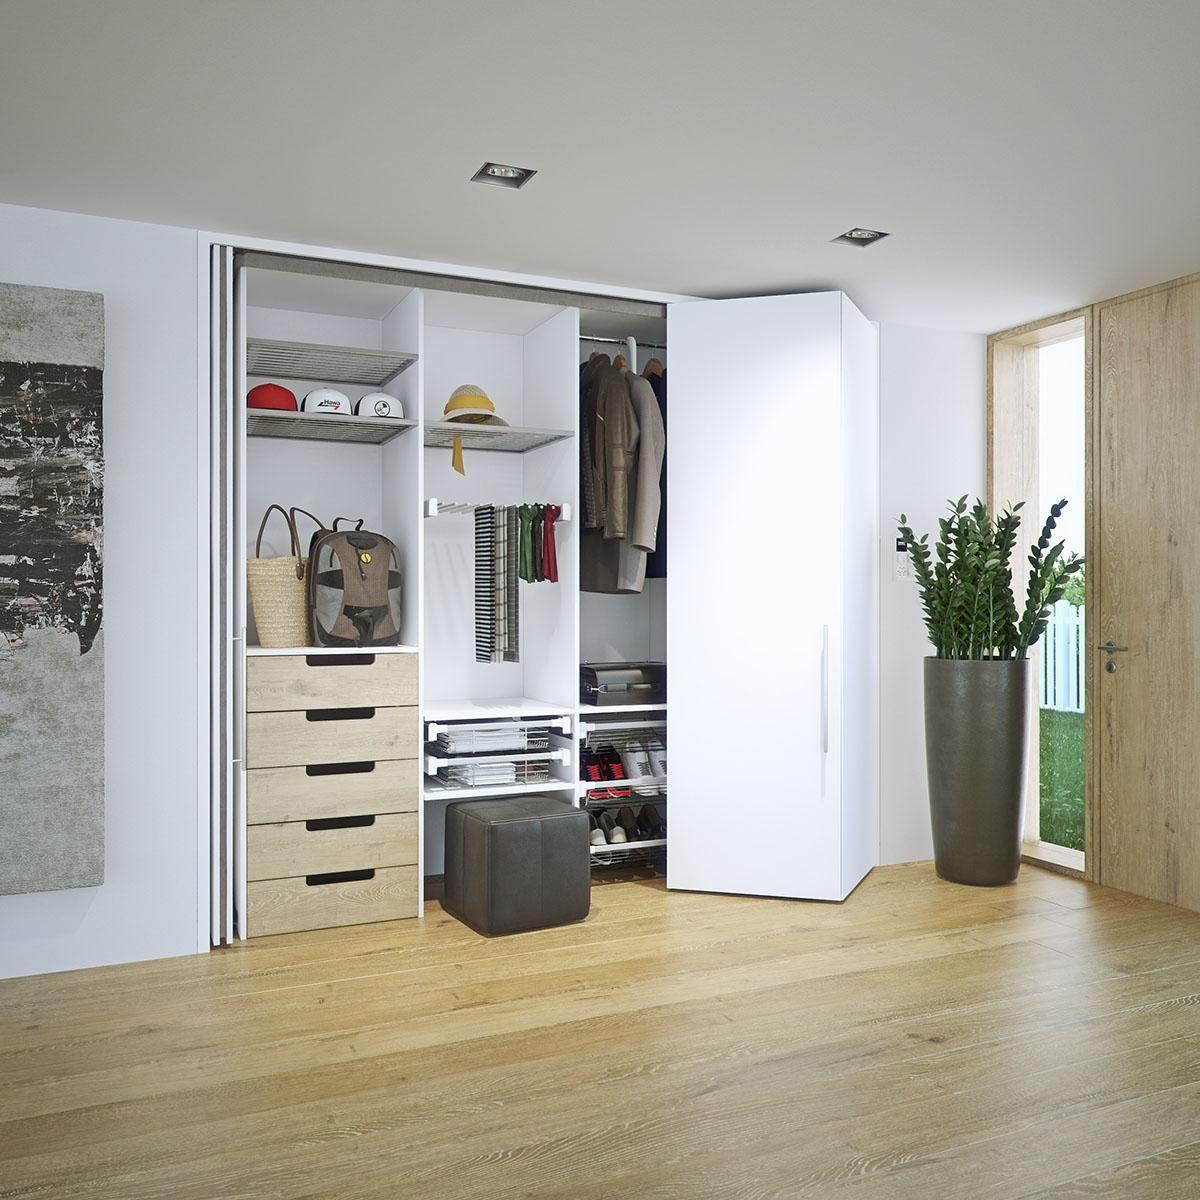 Making space u folding concepta by häfele wall decor